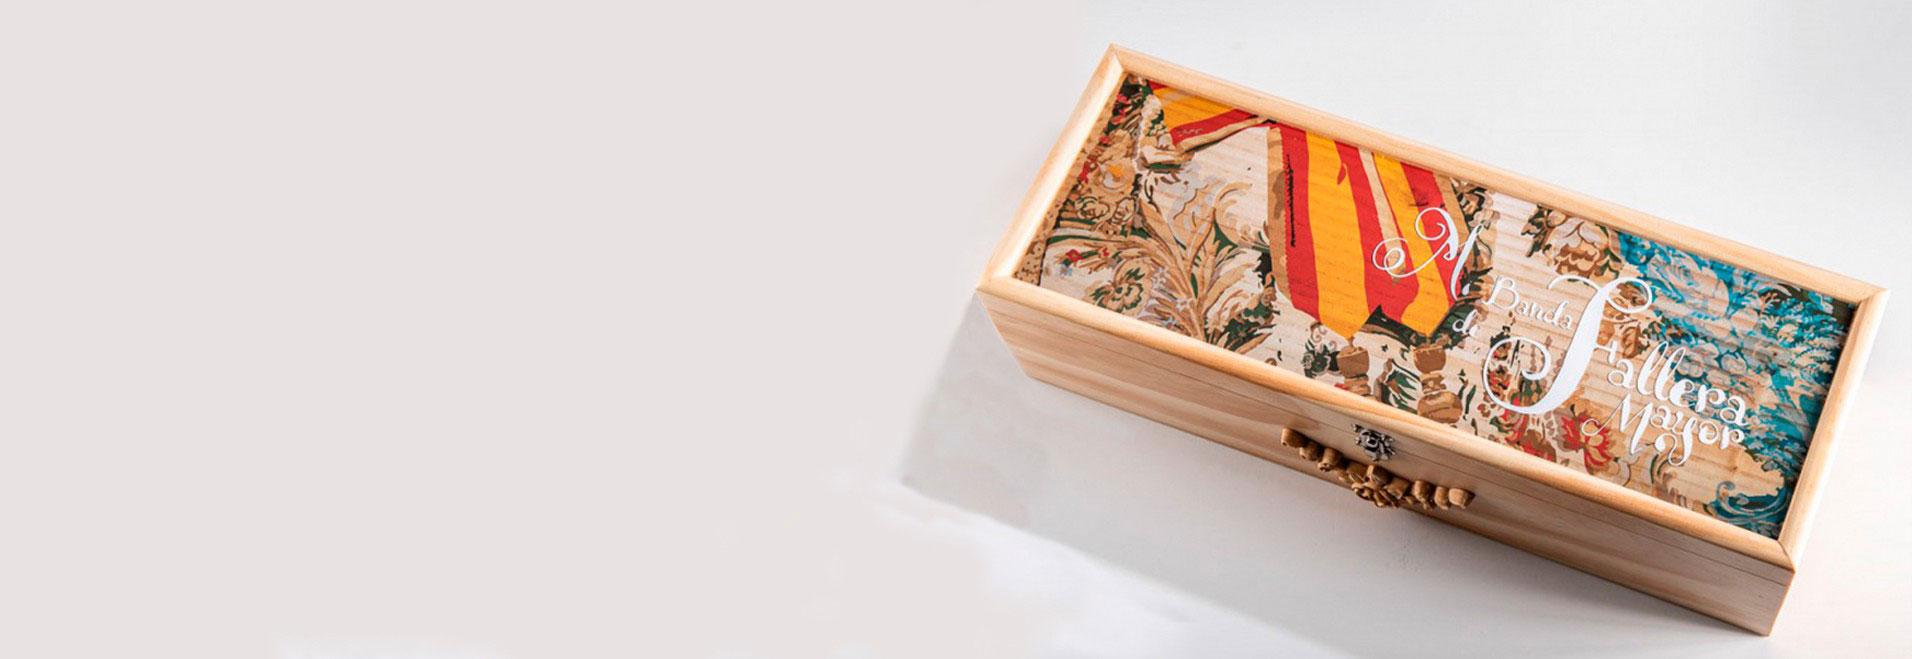 caja decorada de madera para banda de fallera